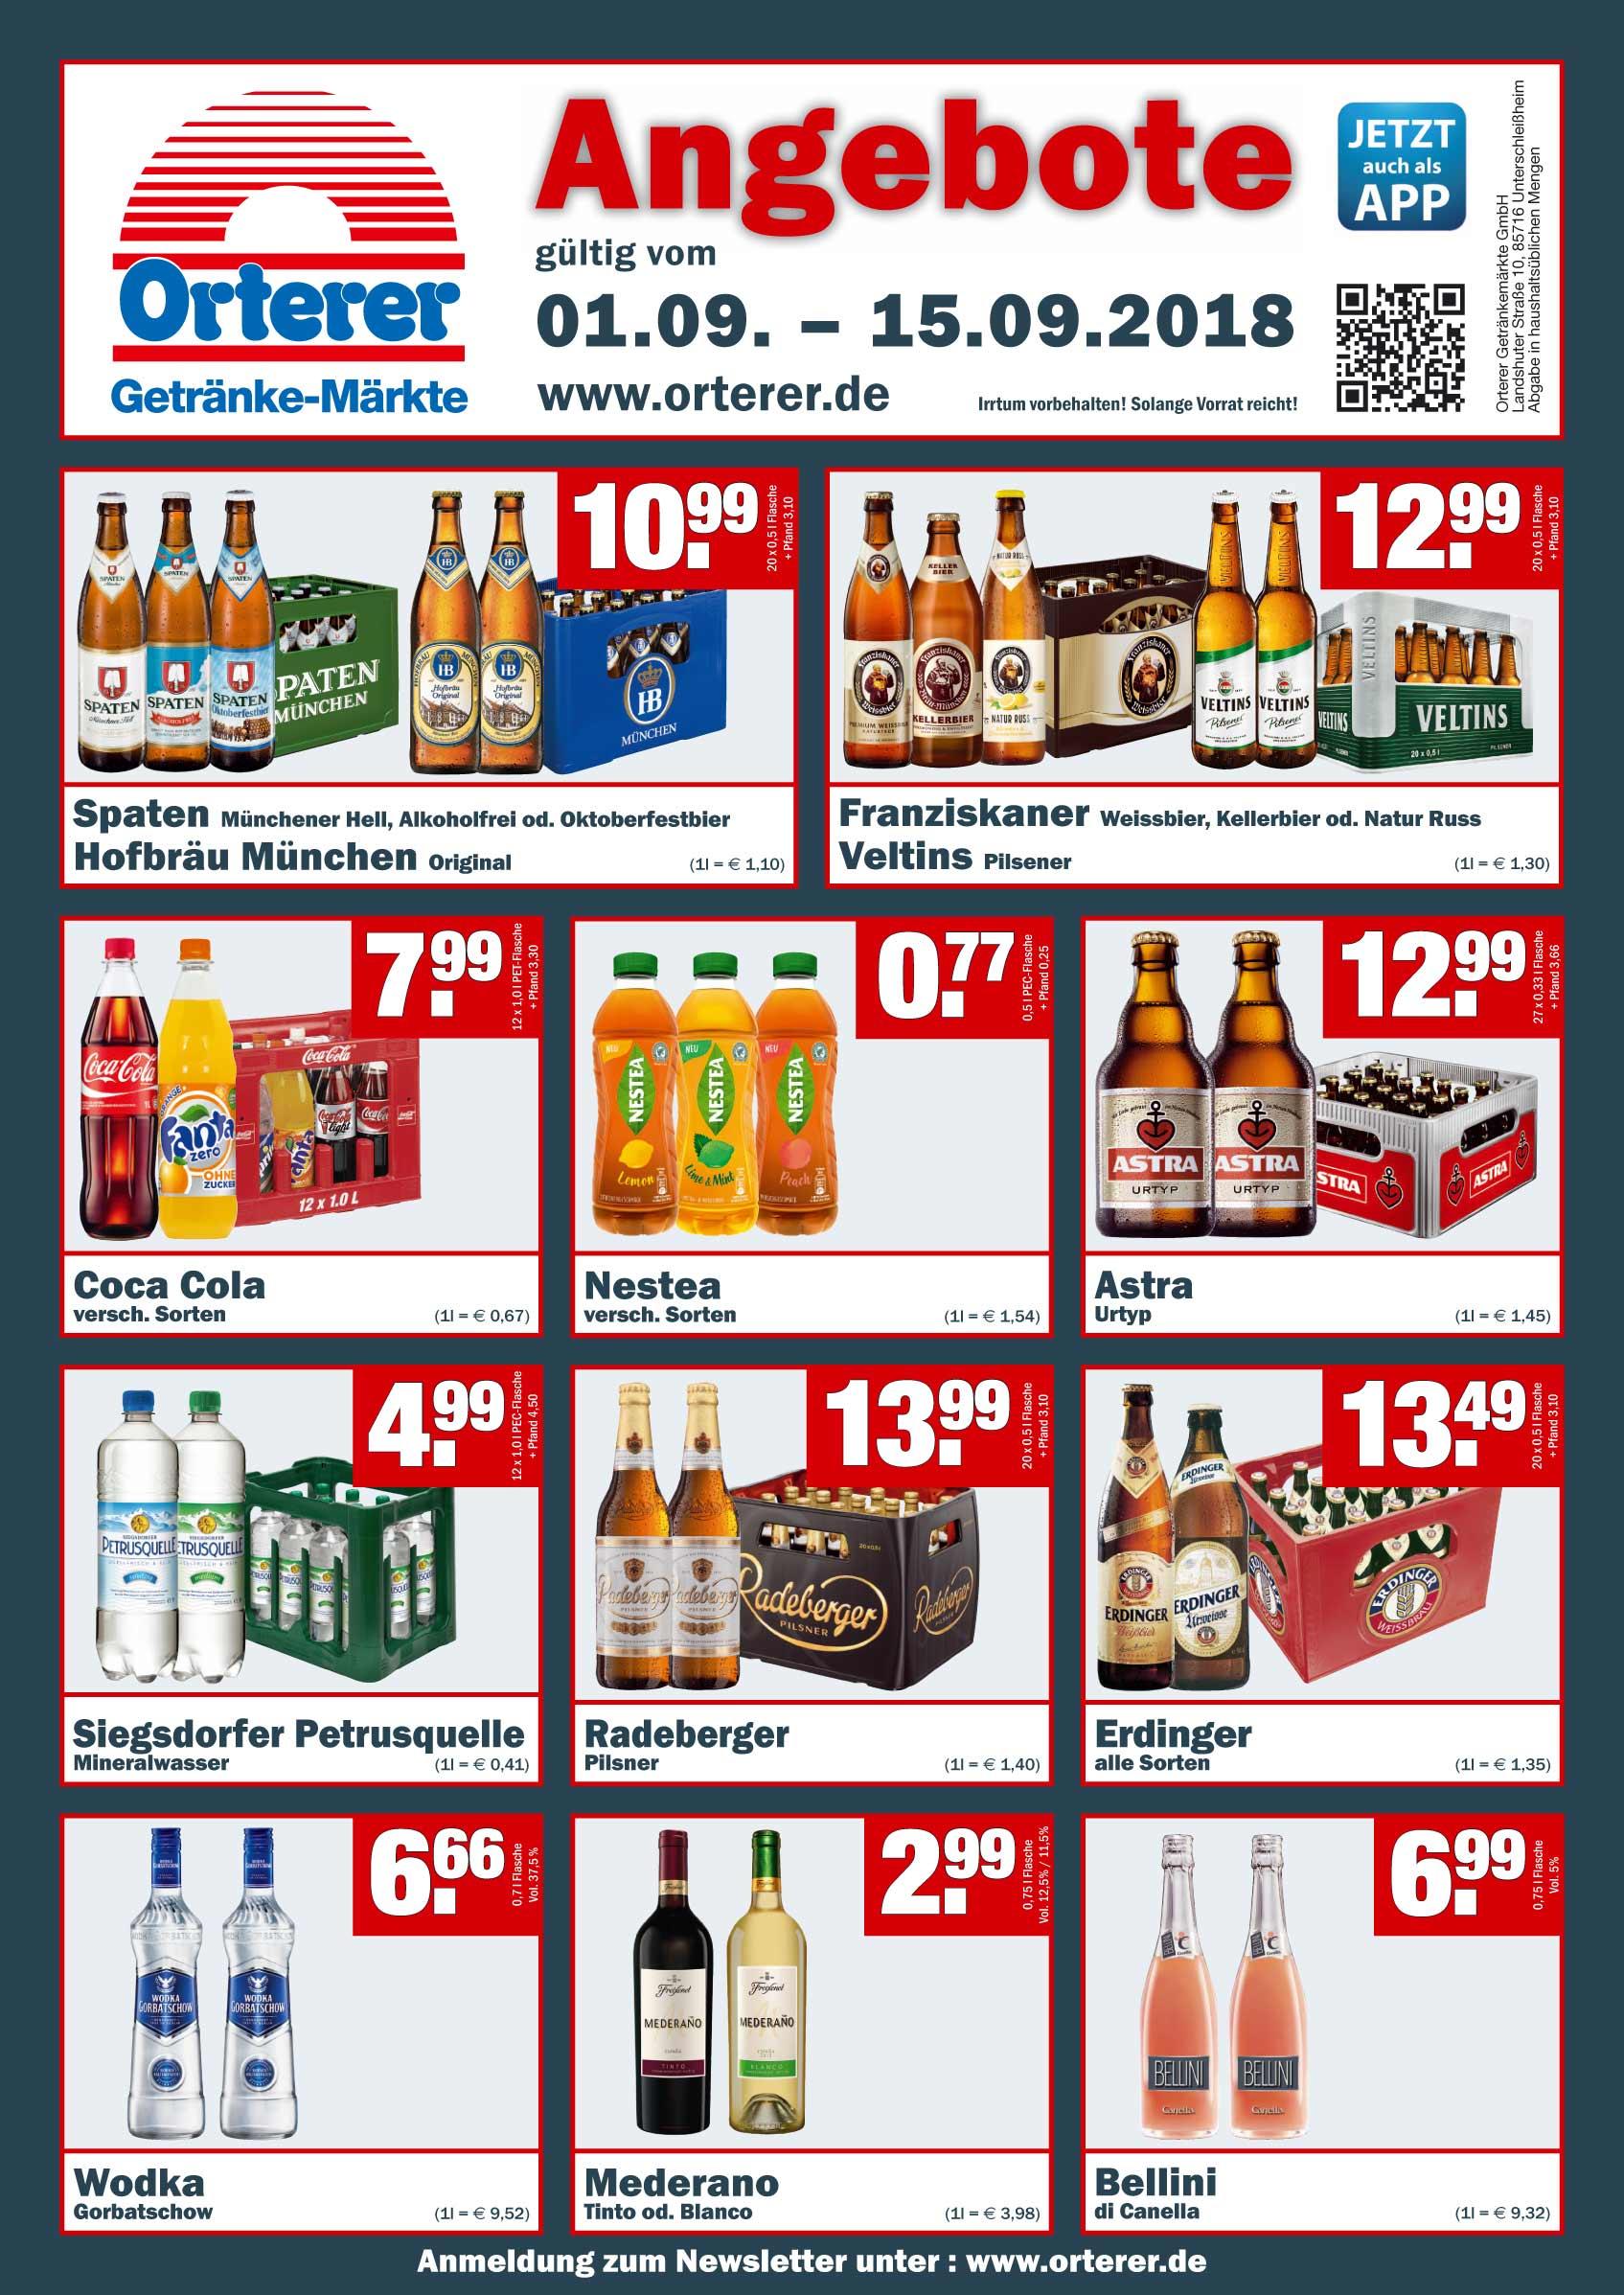 lokal Oberbayern - Orterer Getränkemärkte ] Coca Cola 12x1,0l Kasten ...